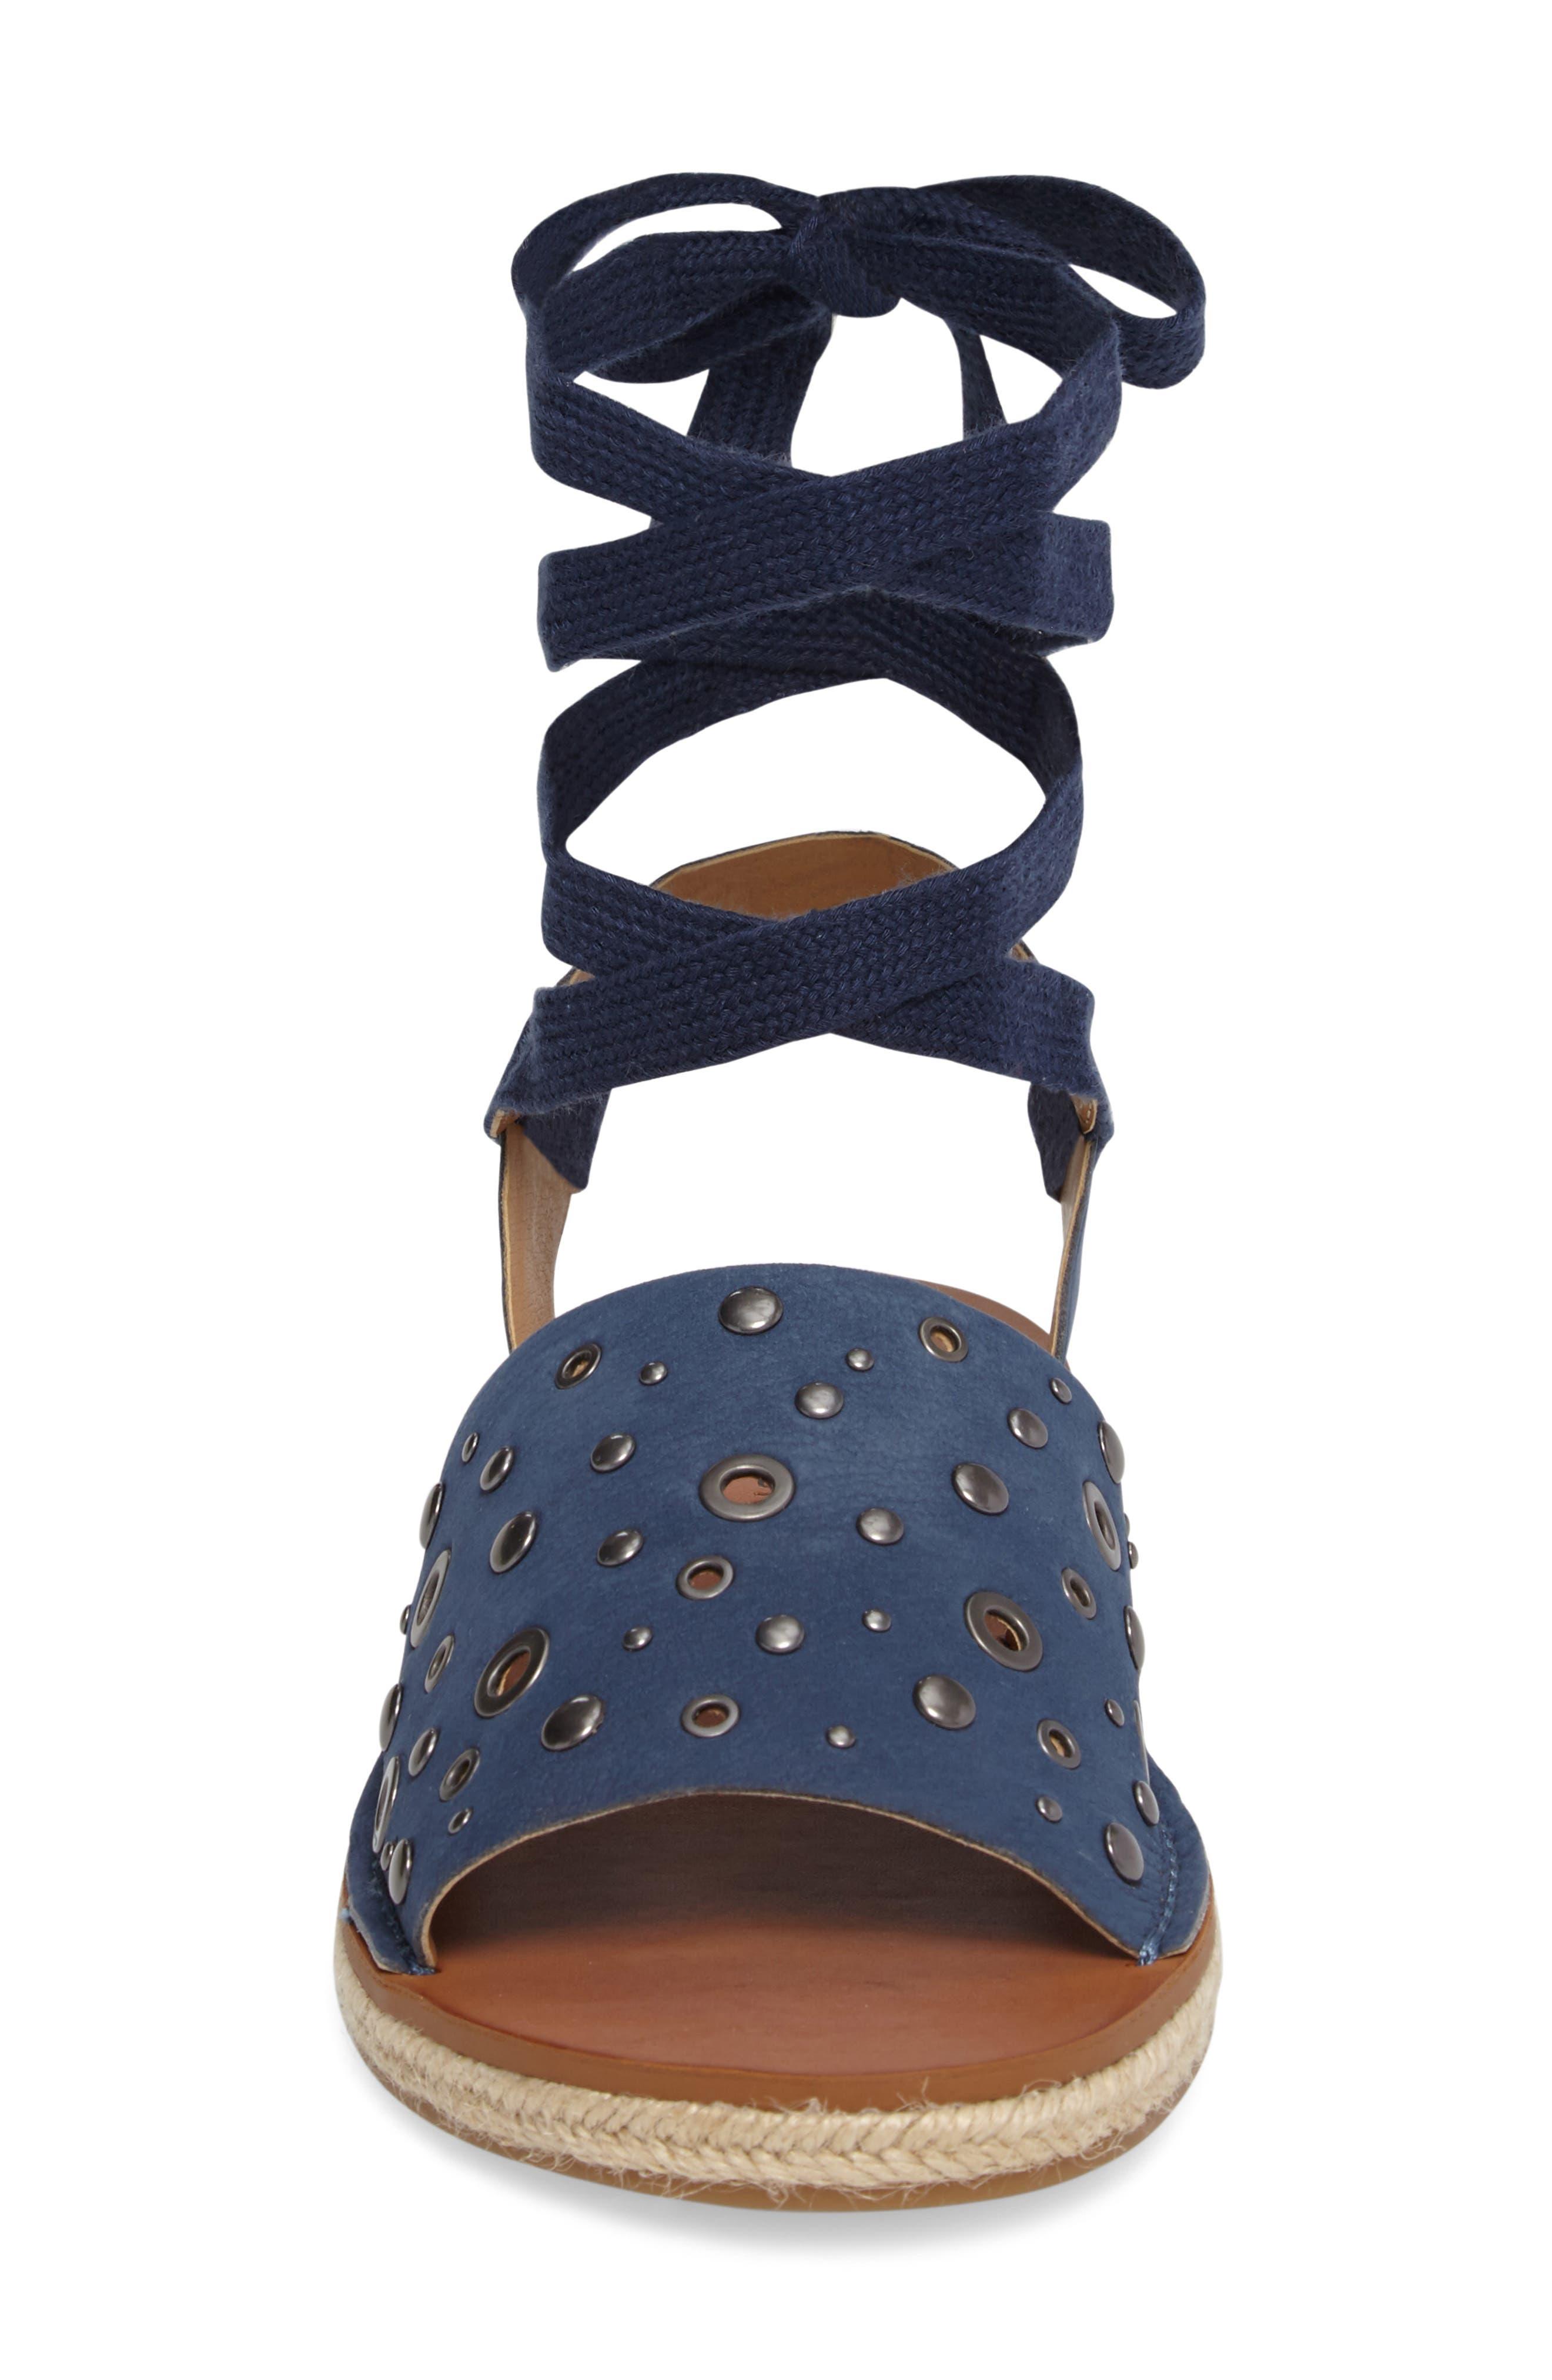 Daytah Ankle Tie Sandal,                             Alternate thumbnail 16, color,